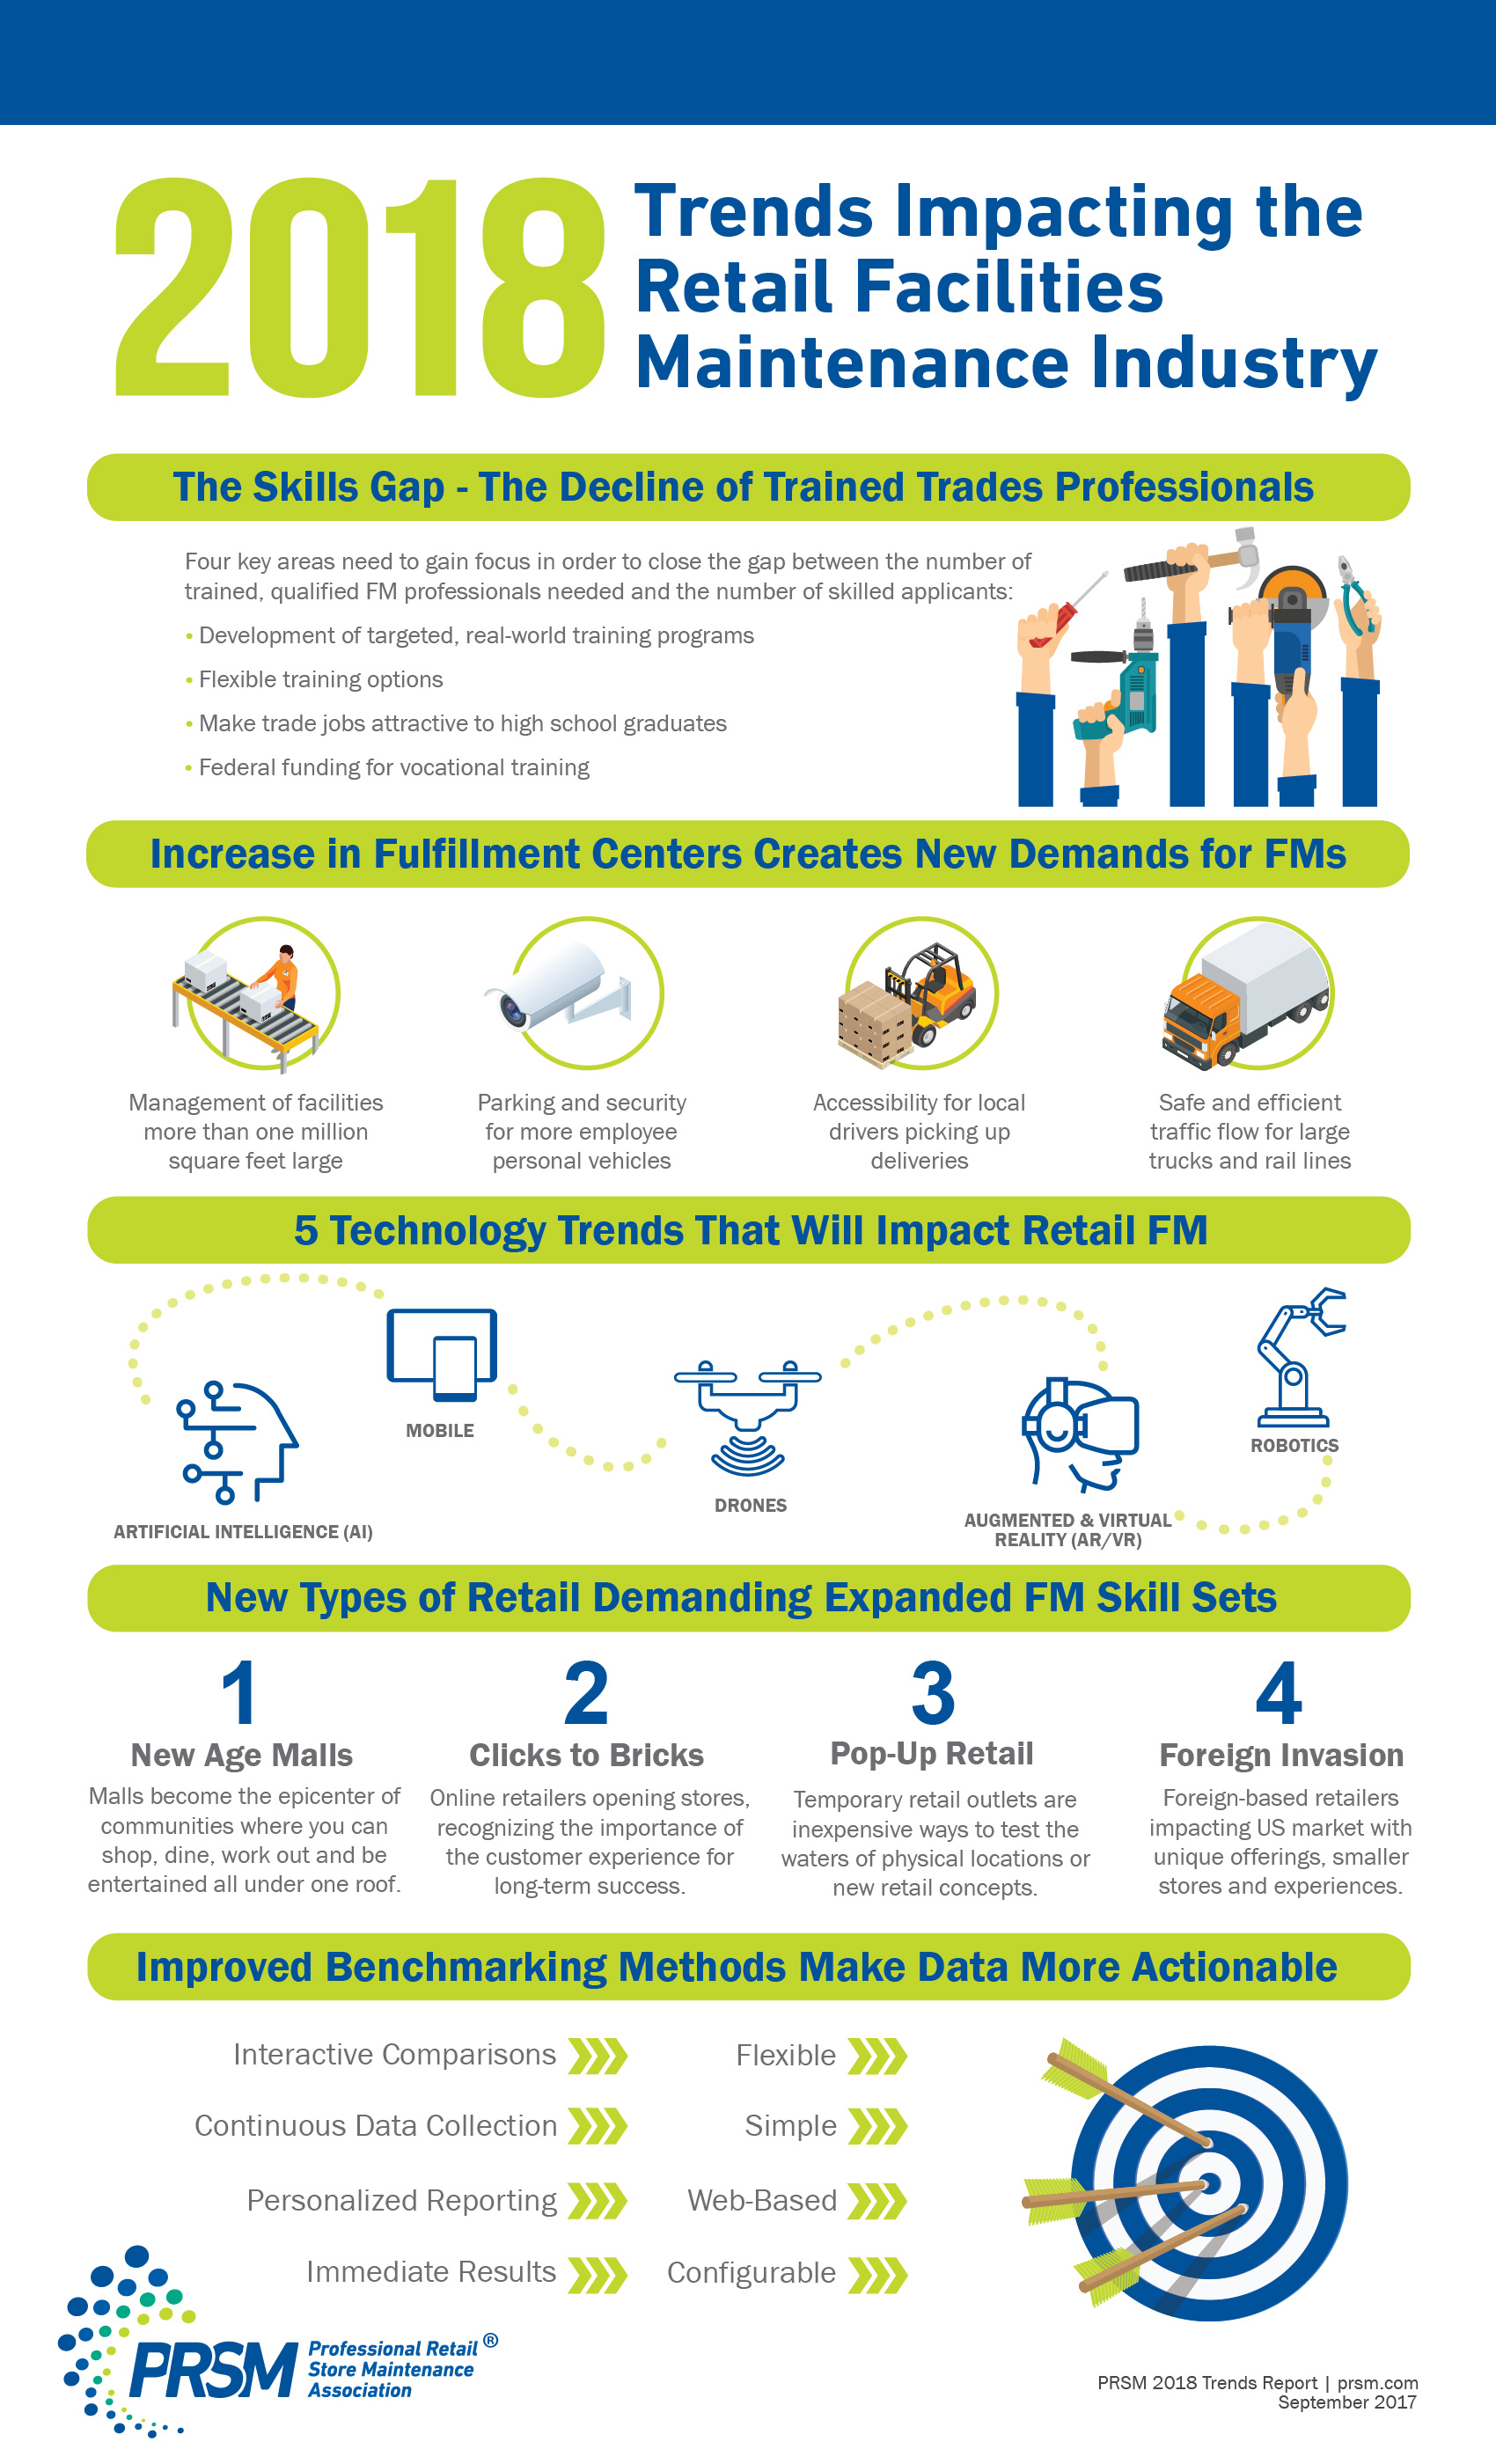 PRSM retail FM trends infographic